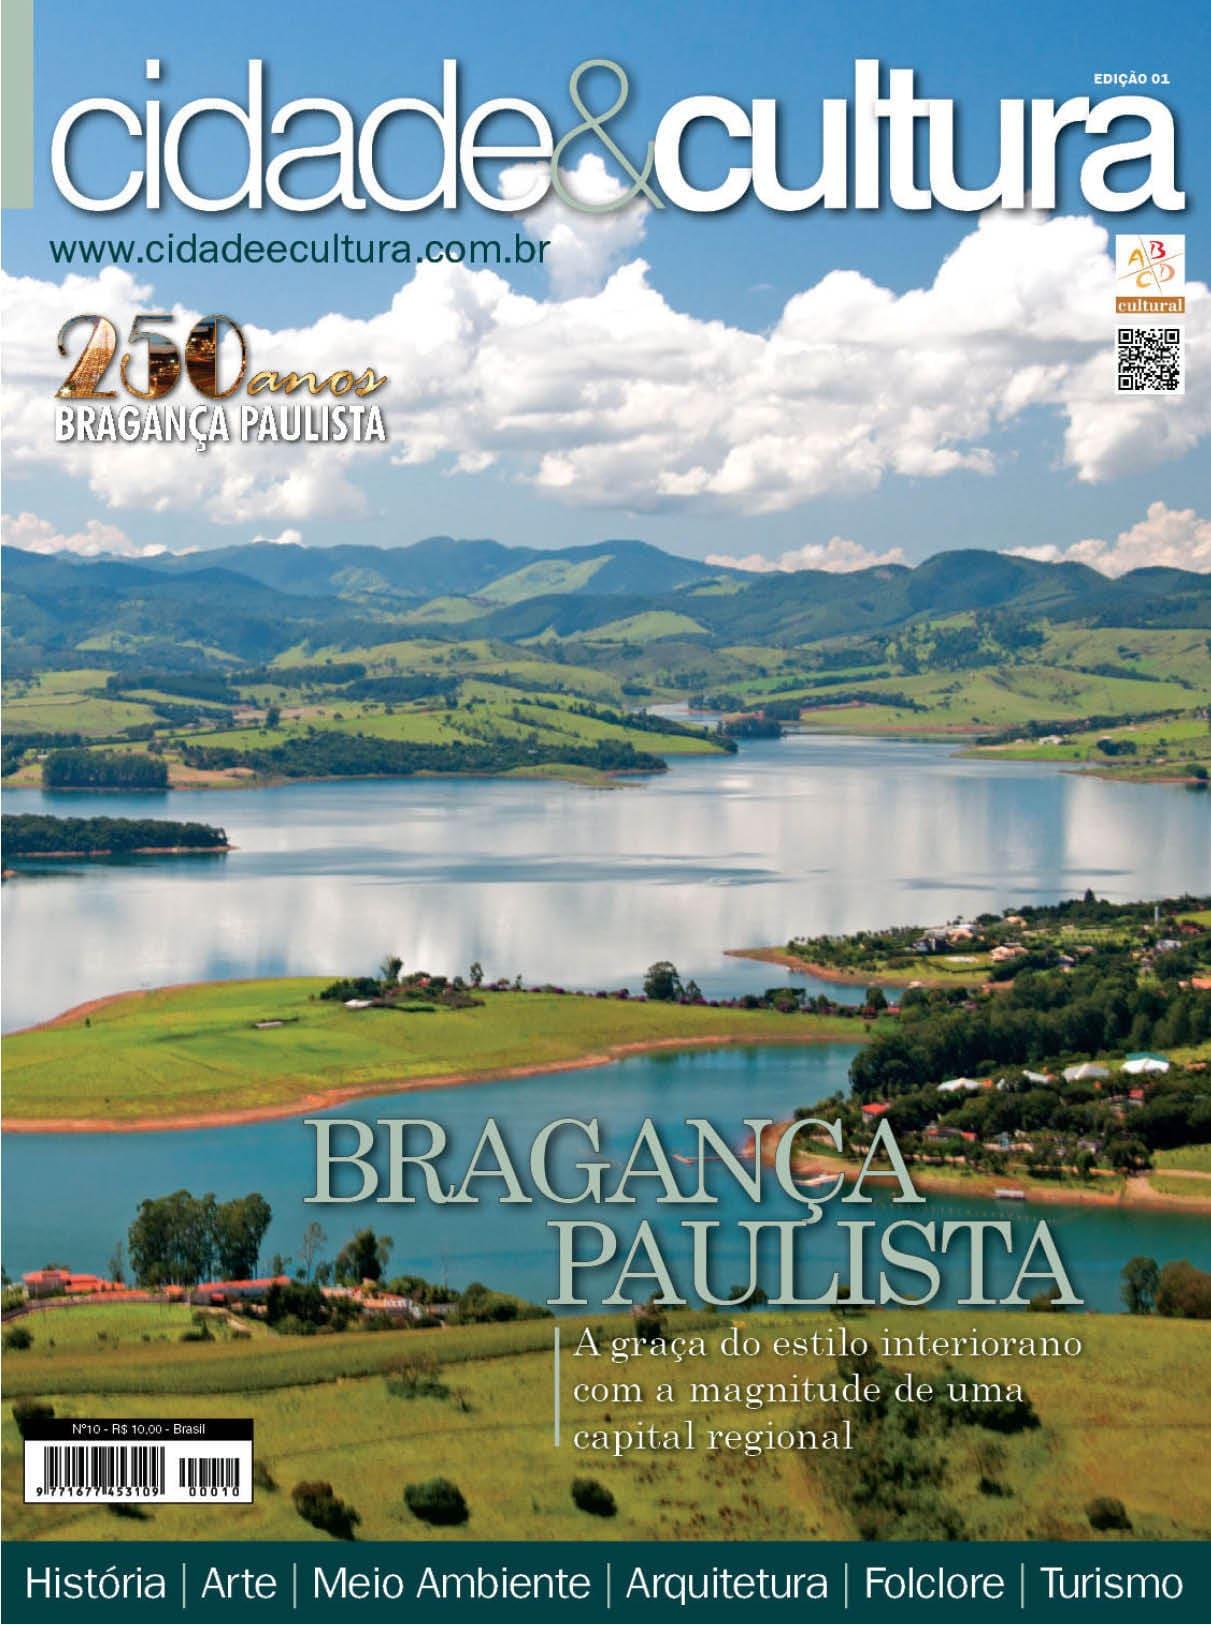 Bragança Paulista ed.1